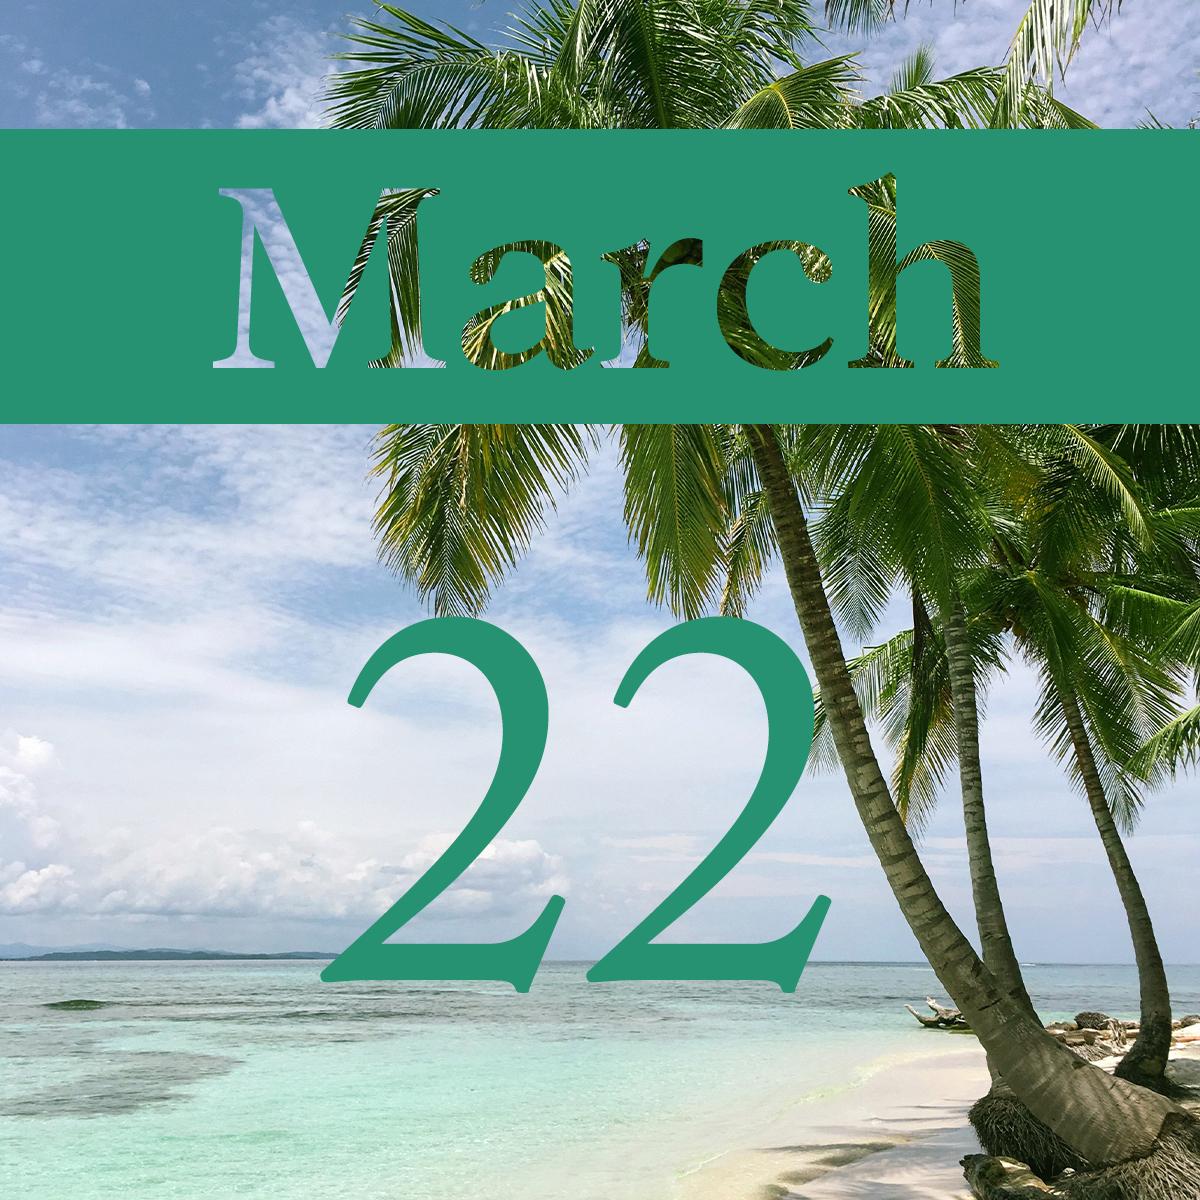 Sunday, March 22nd